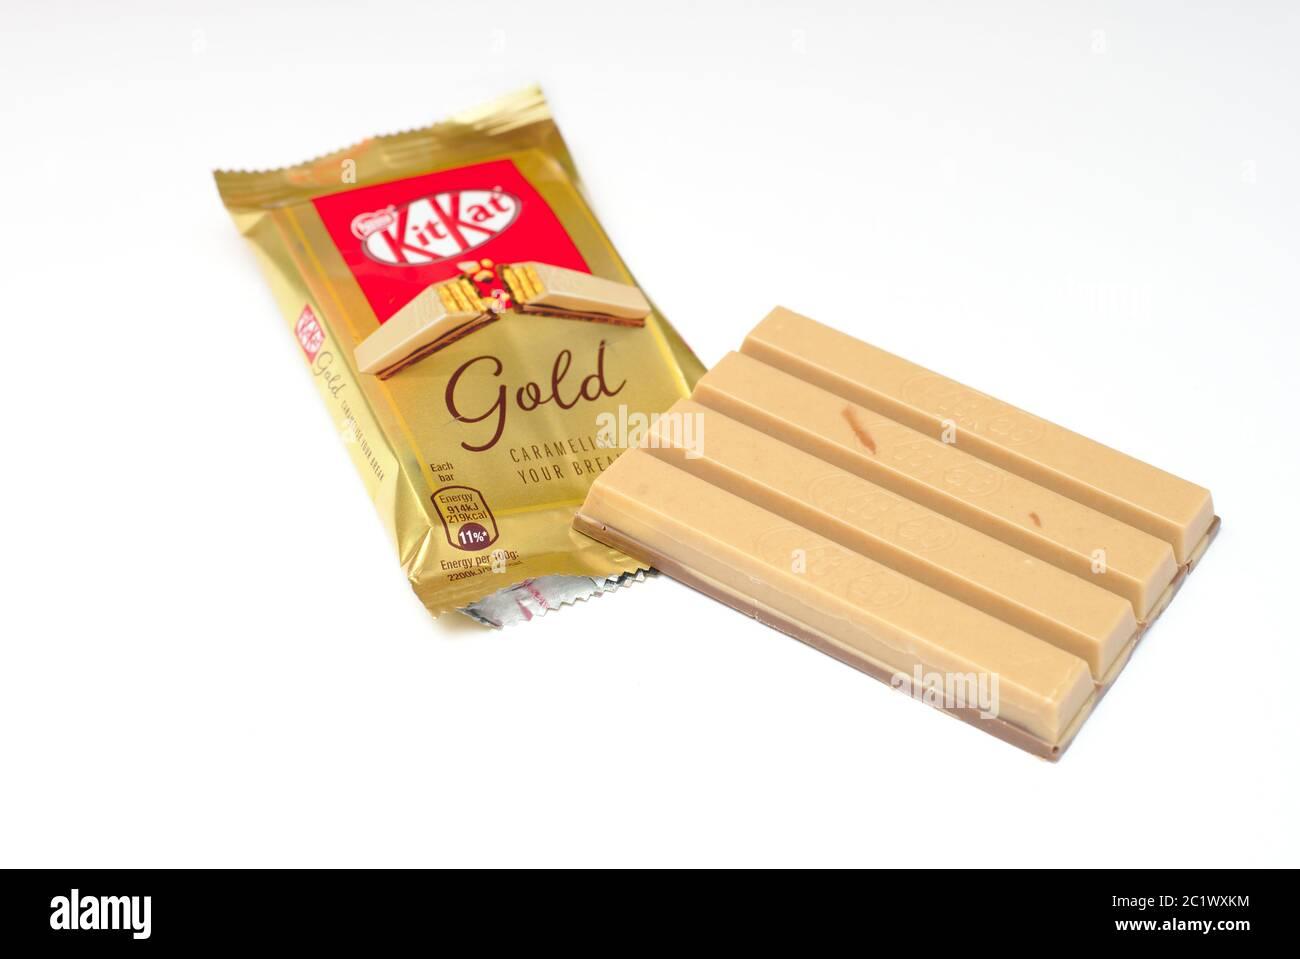 Kit Kat gold, UK limited edition Stock Photo